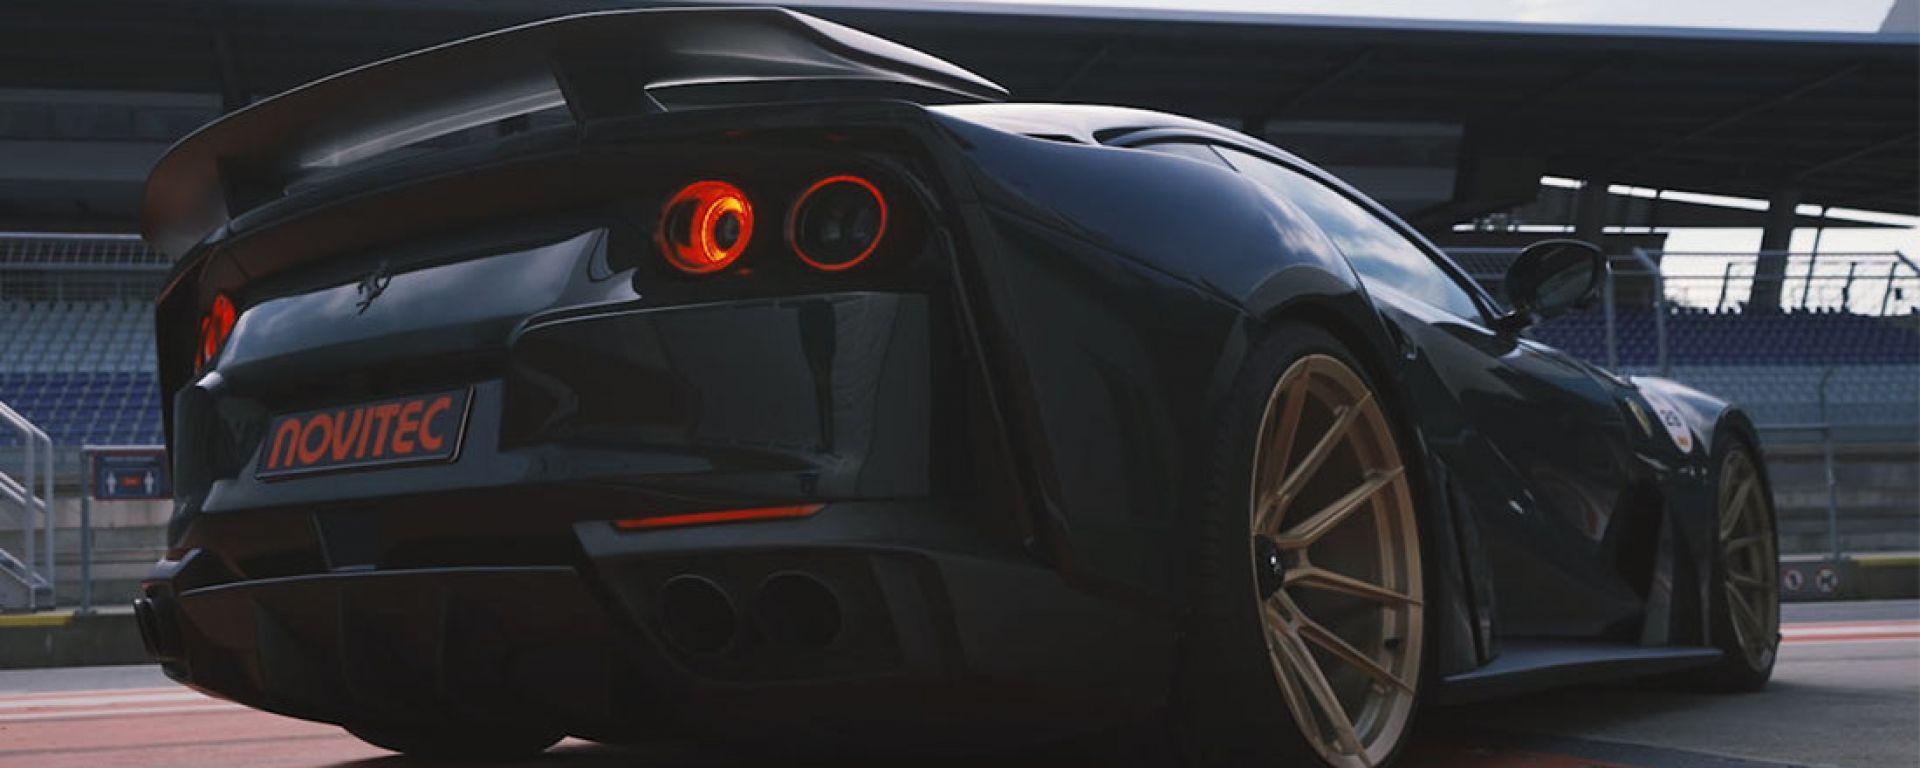 Video: il kit di Novitec per Ferrari 812 Superfast